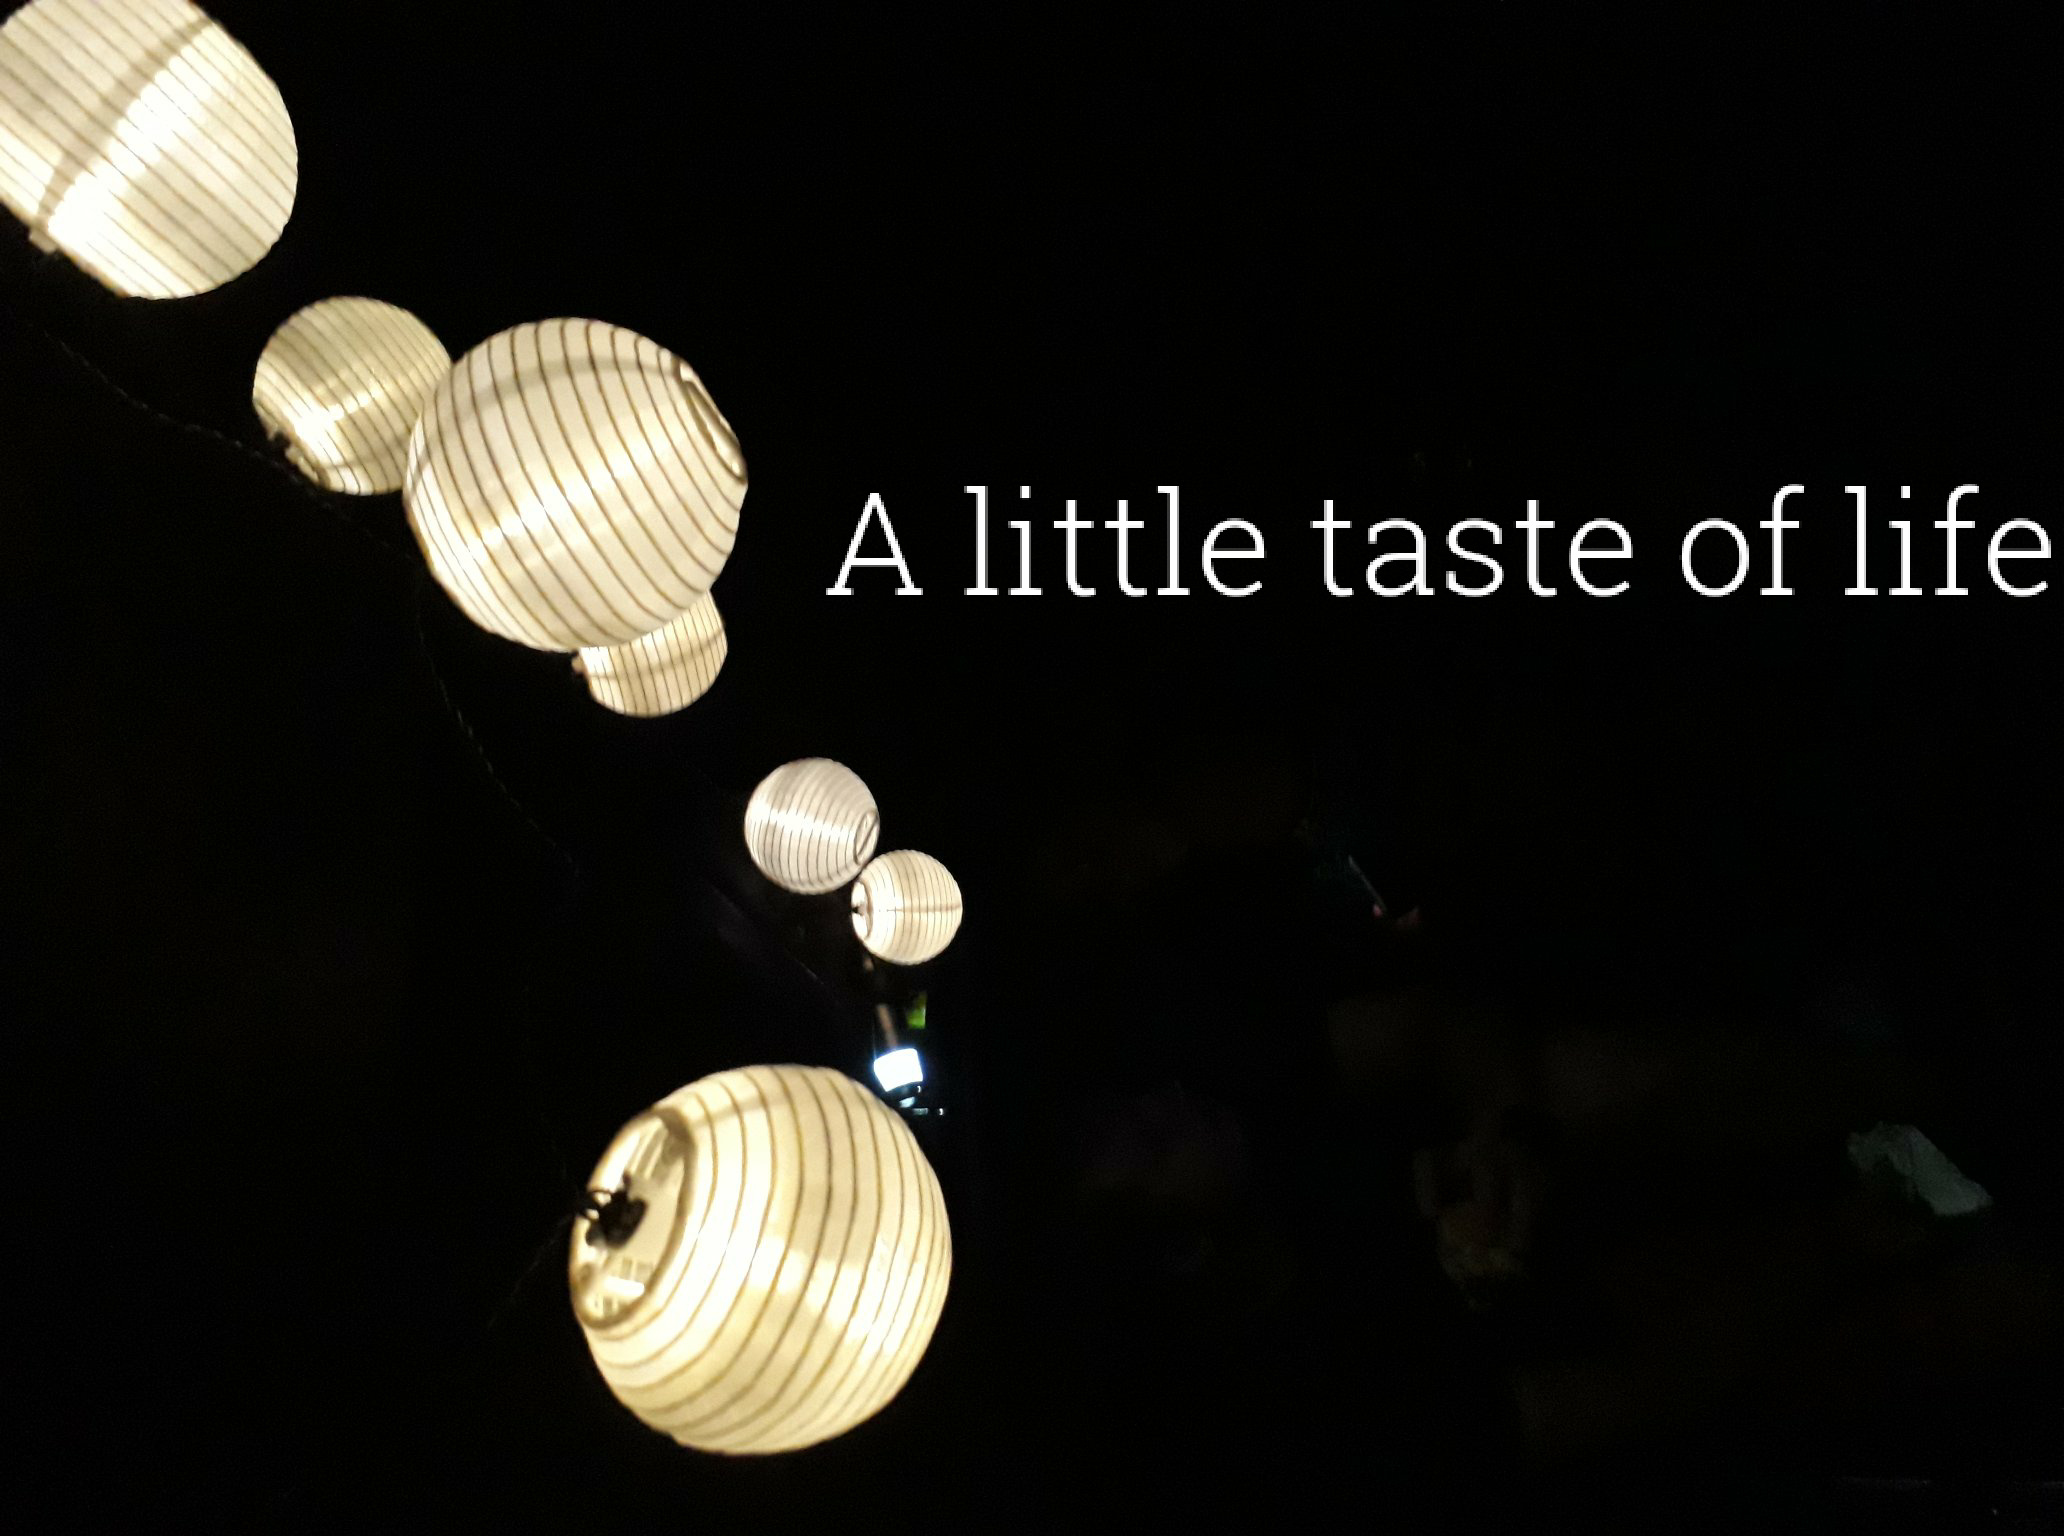 A little taste of life